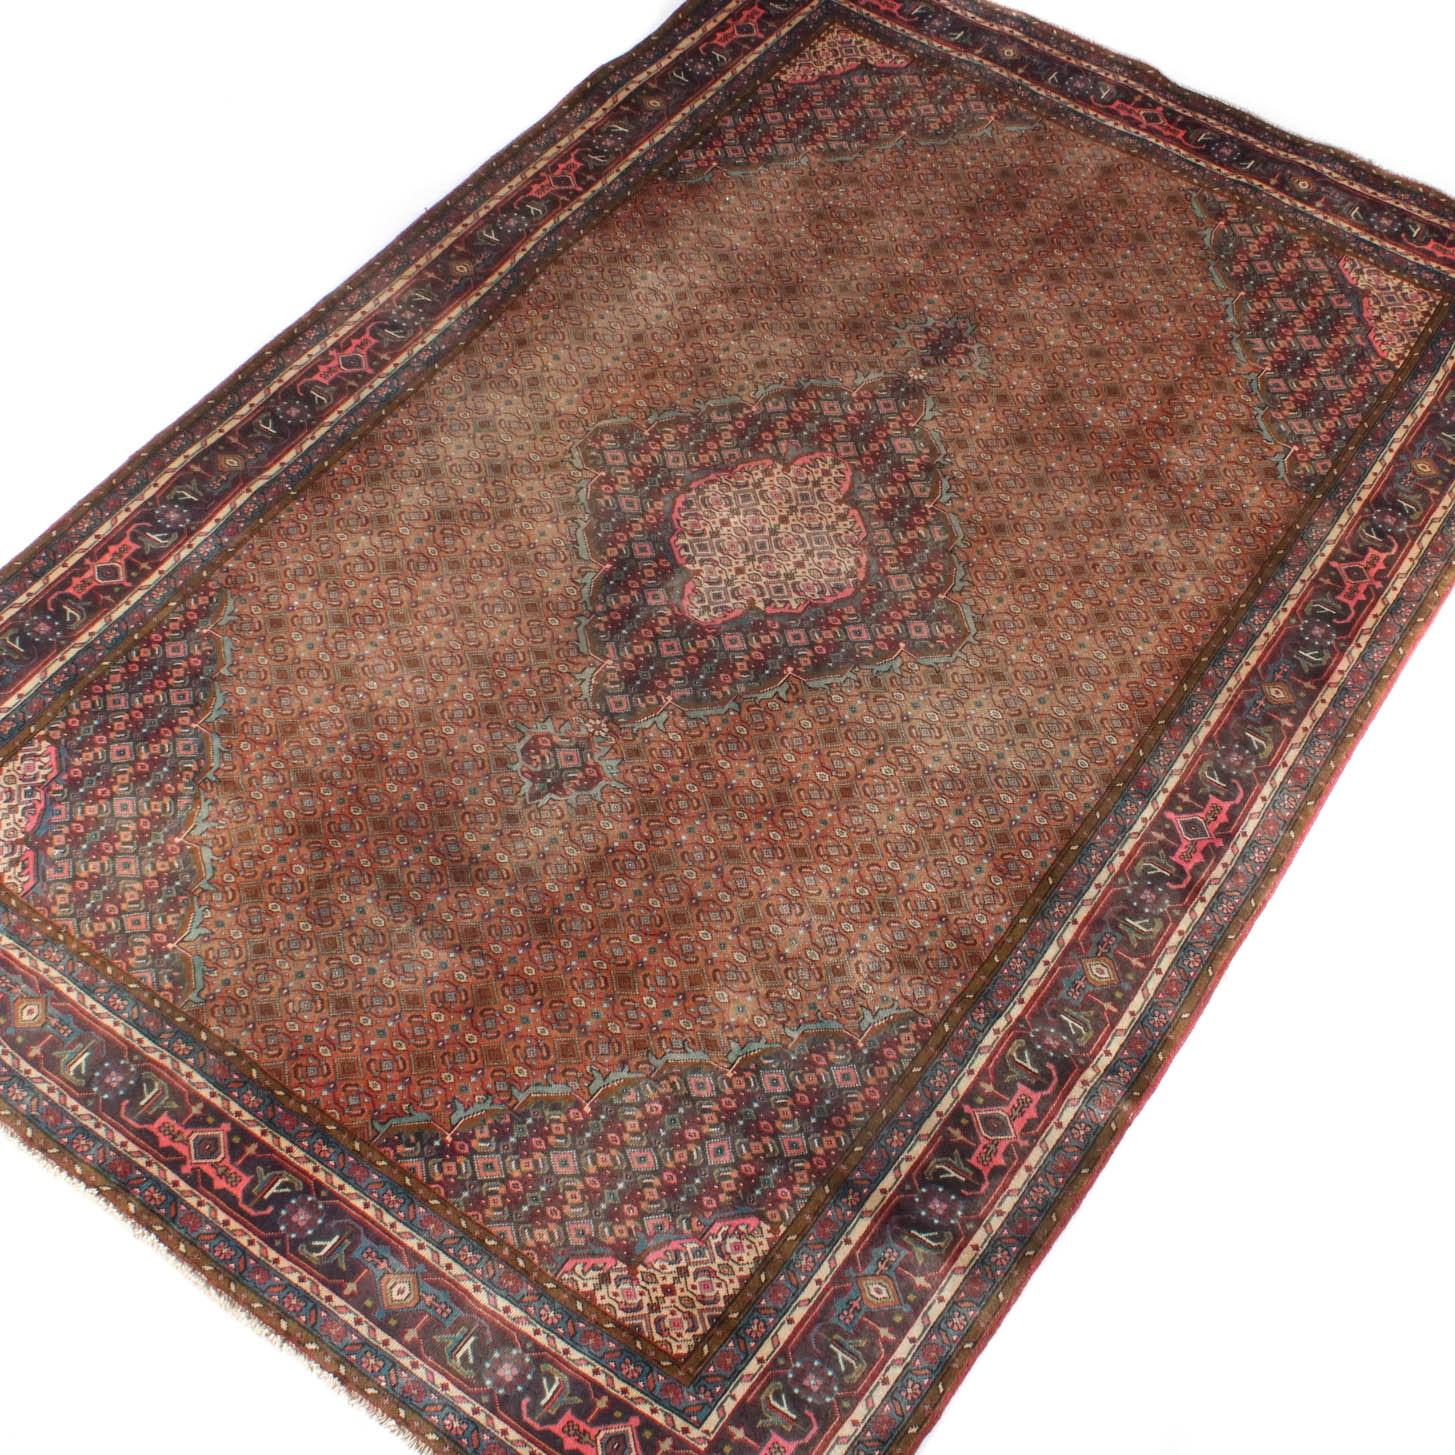 Vintage Hand-Knotted Persian Bijar Wool Area Rug